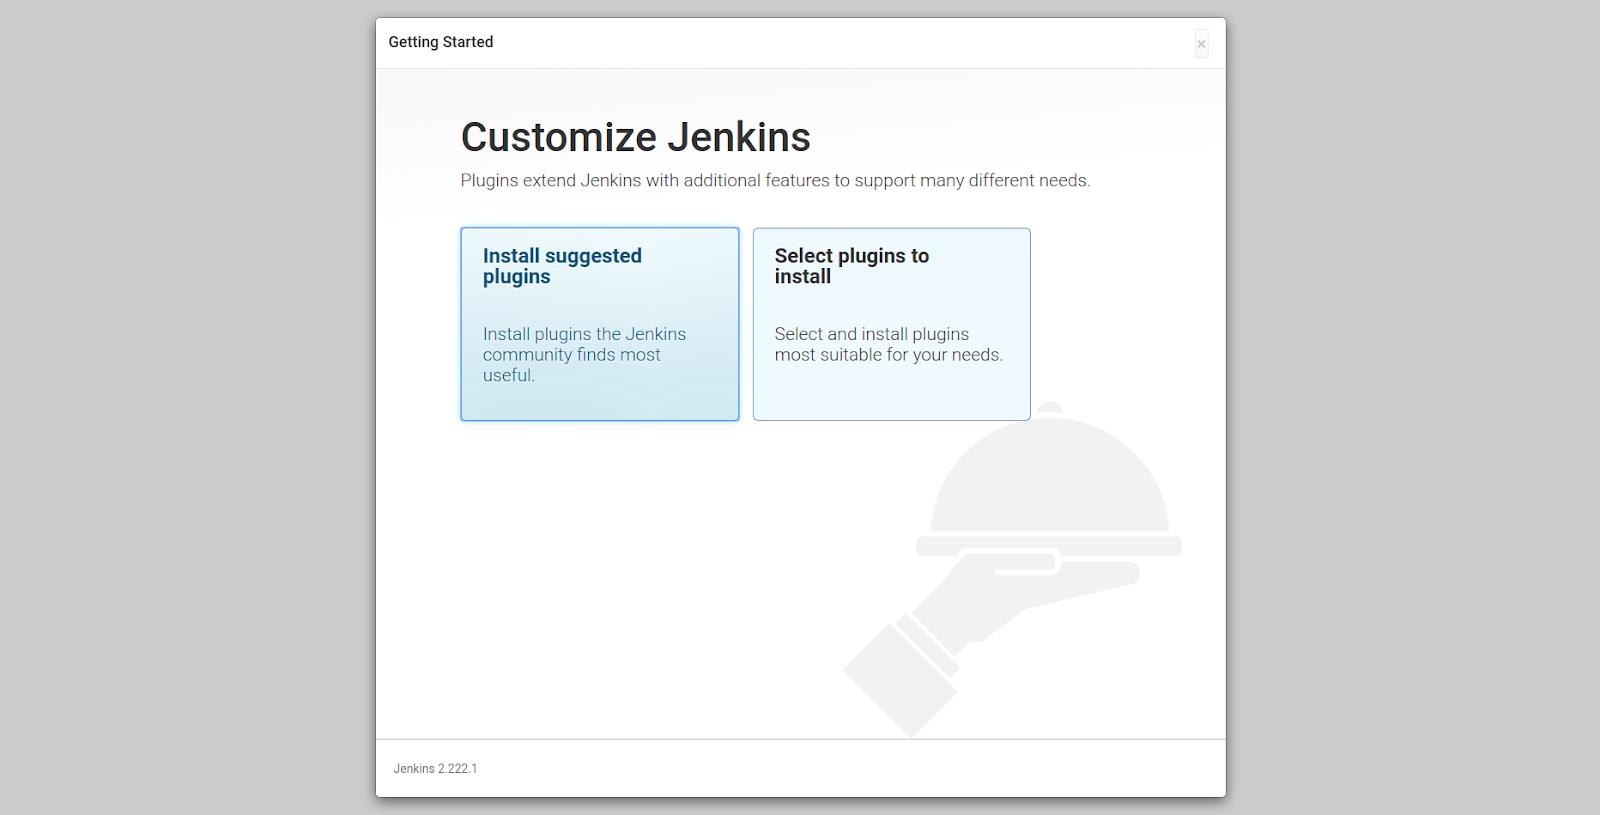 choosing-plugins-jenkins-installation